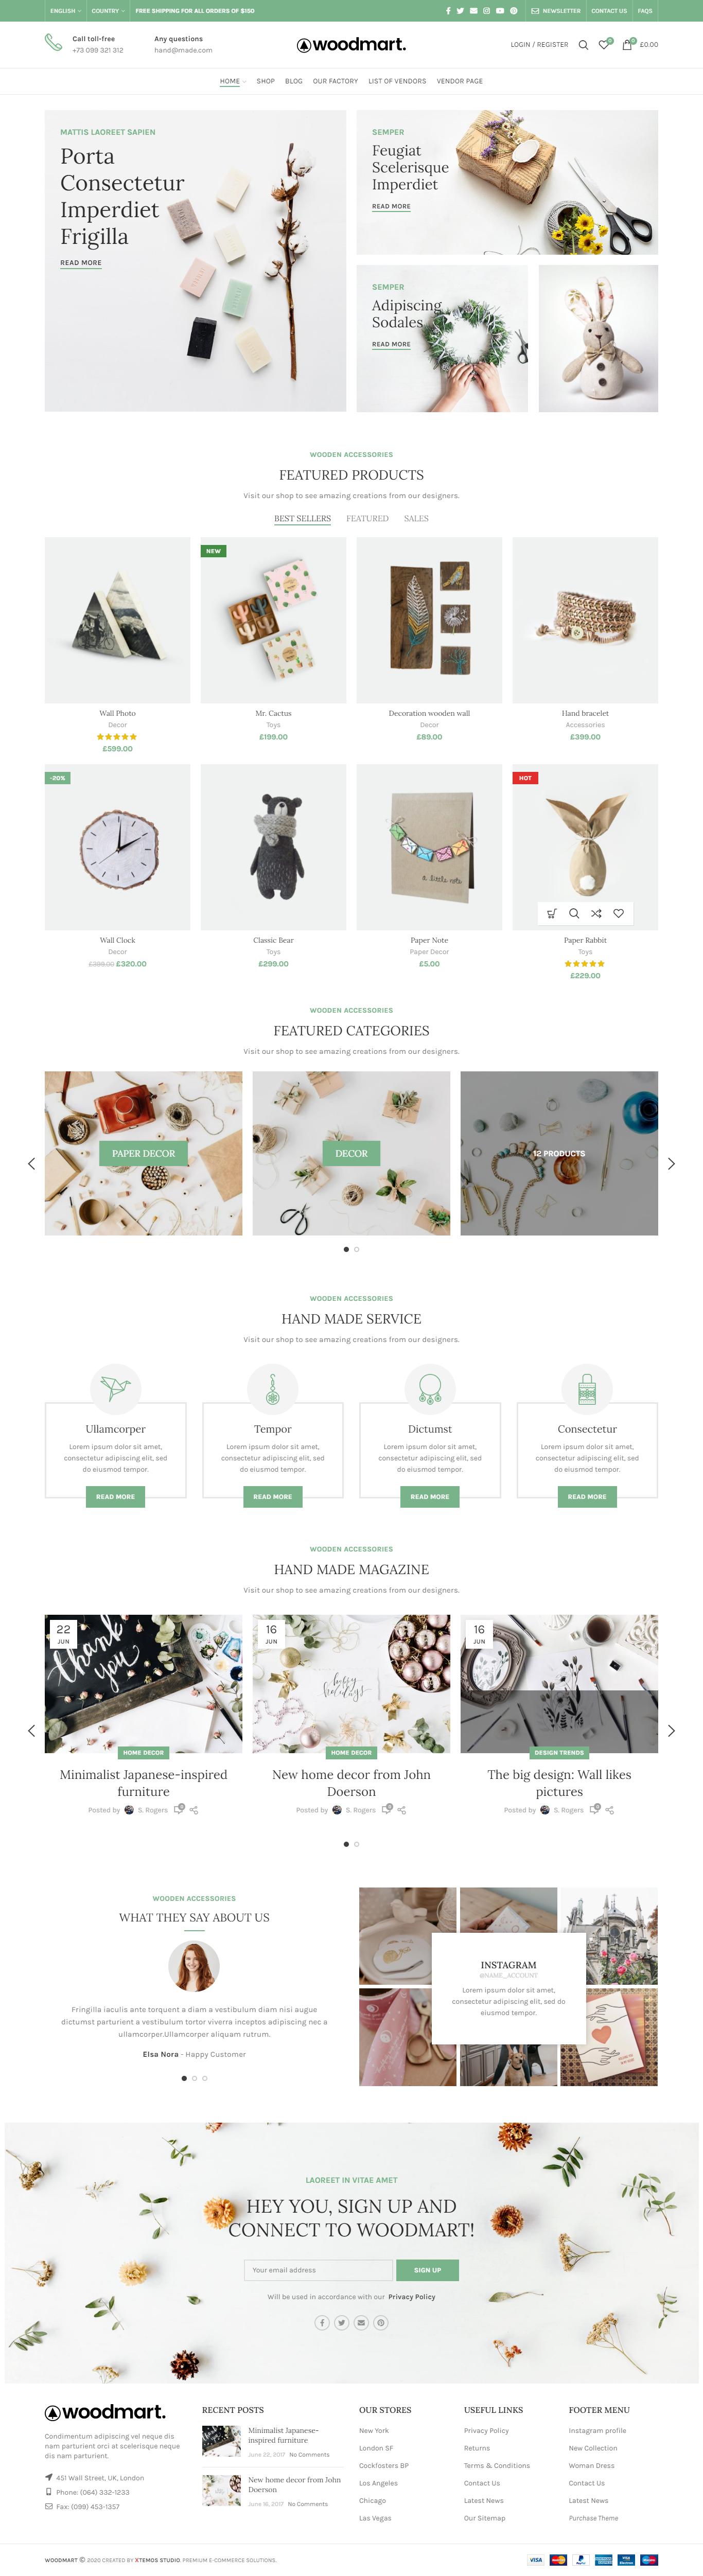 Handmade Web Design Web Templates Duofankaar In 2020 Create Website Templates Website Template Design